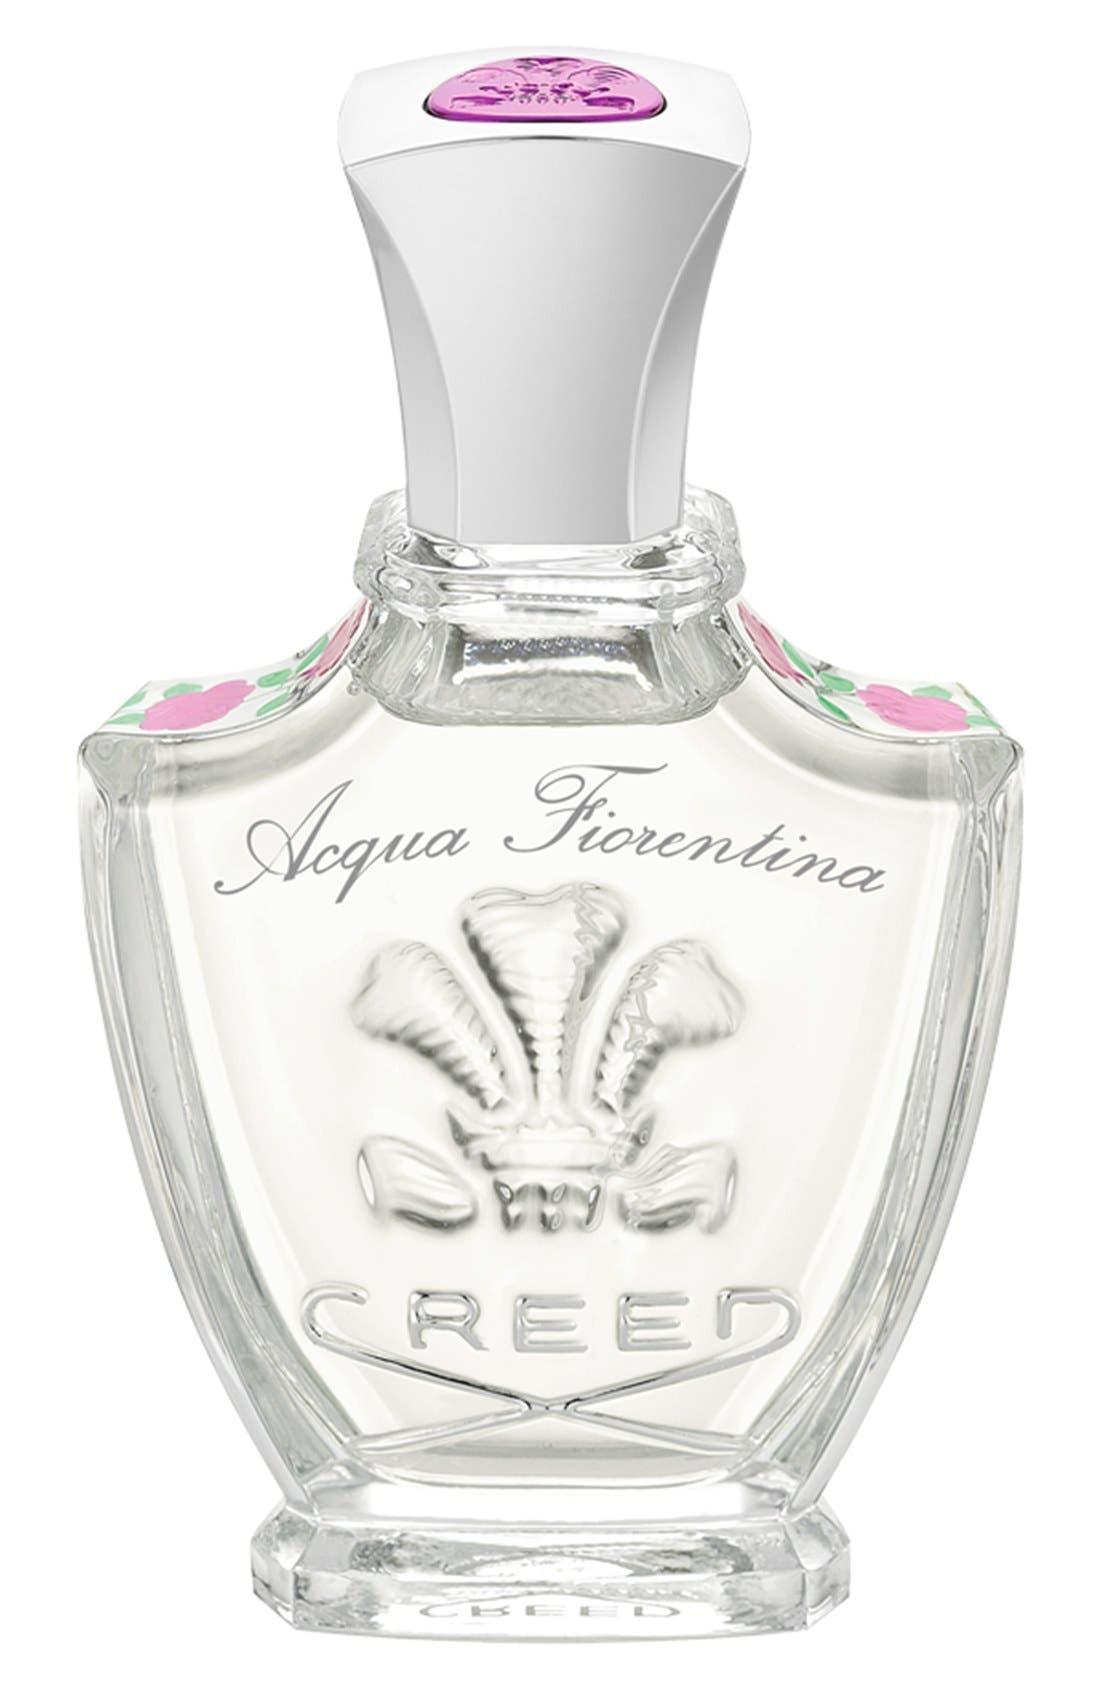 Creed 'Acqua Fiorentina' Fragrance